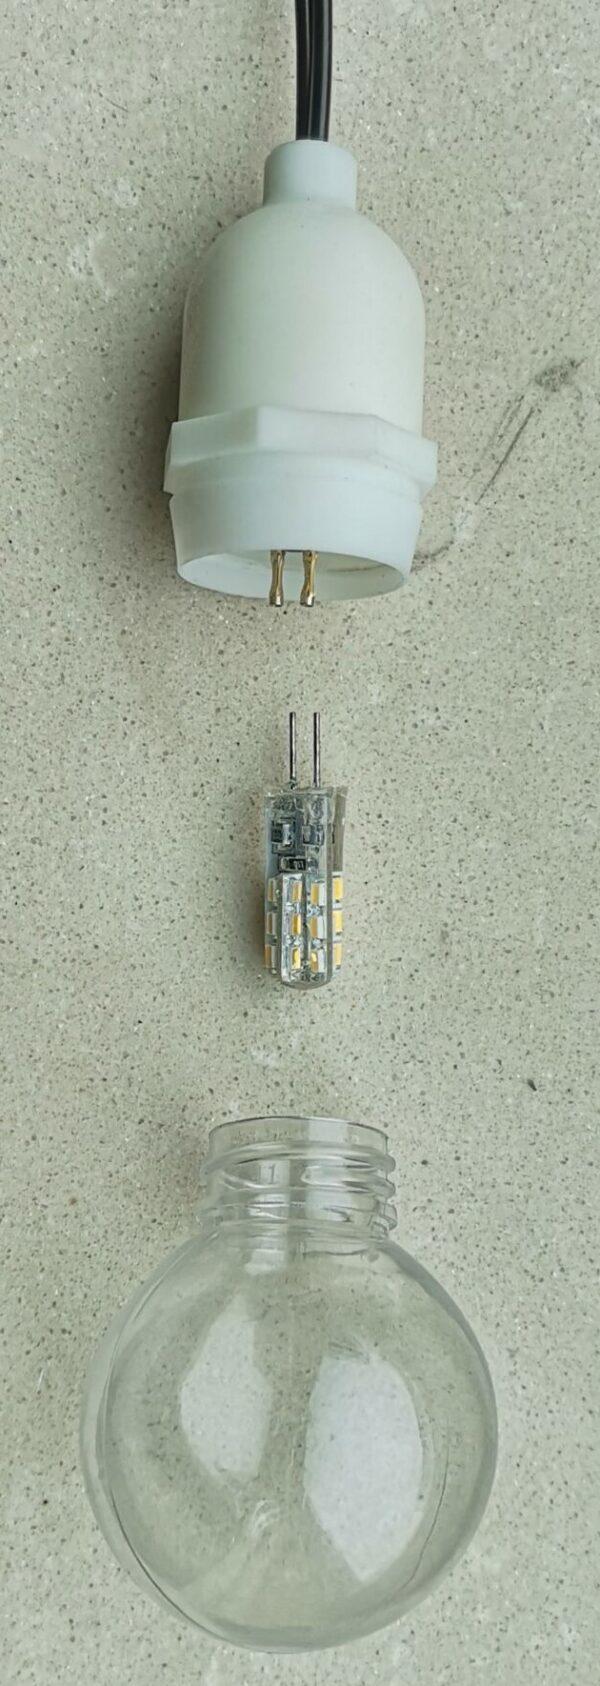 3D Stern Spritzguss gelb LED Birne - 56 cm - inkl. 7 m Außenkabel und LED Birne